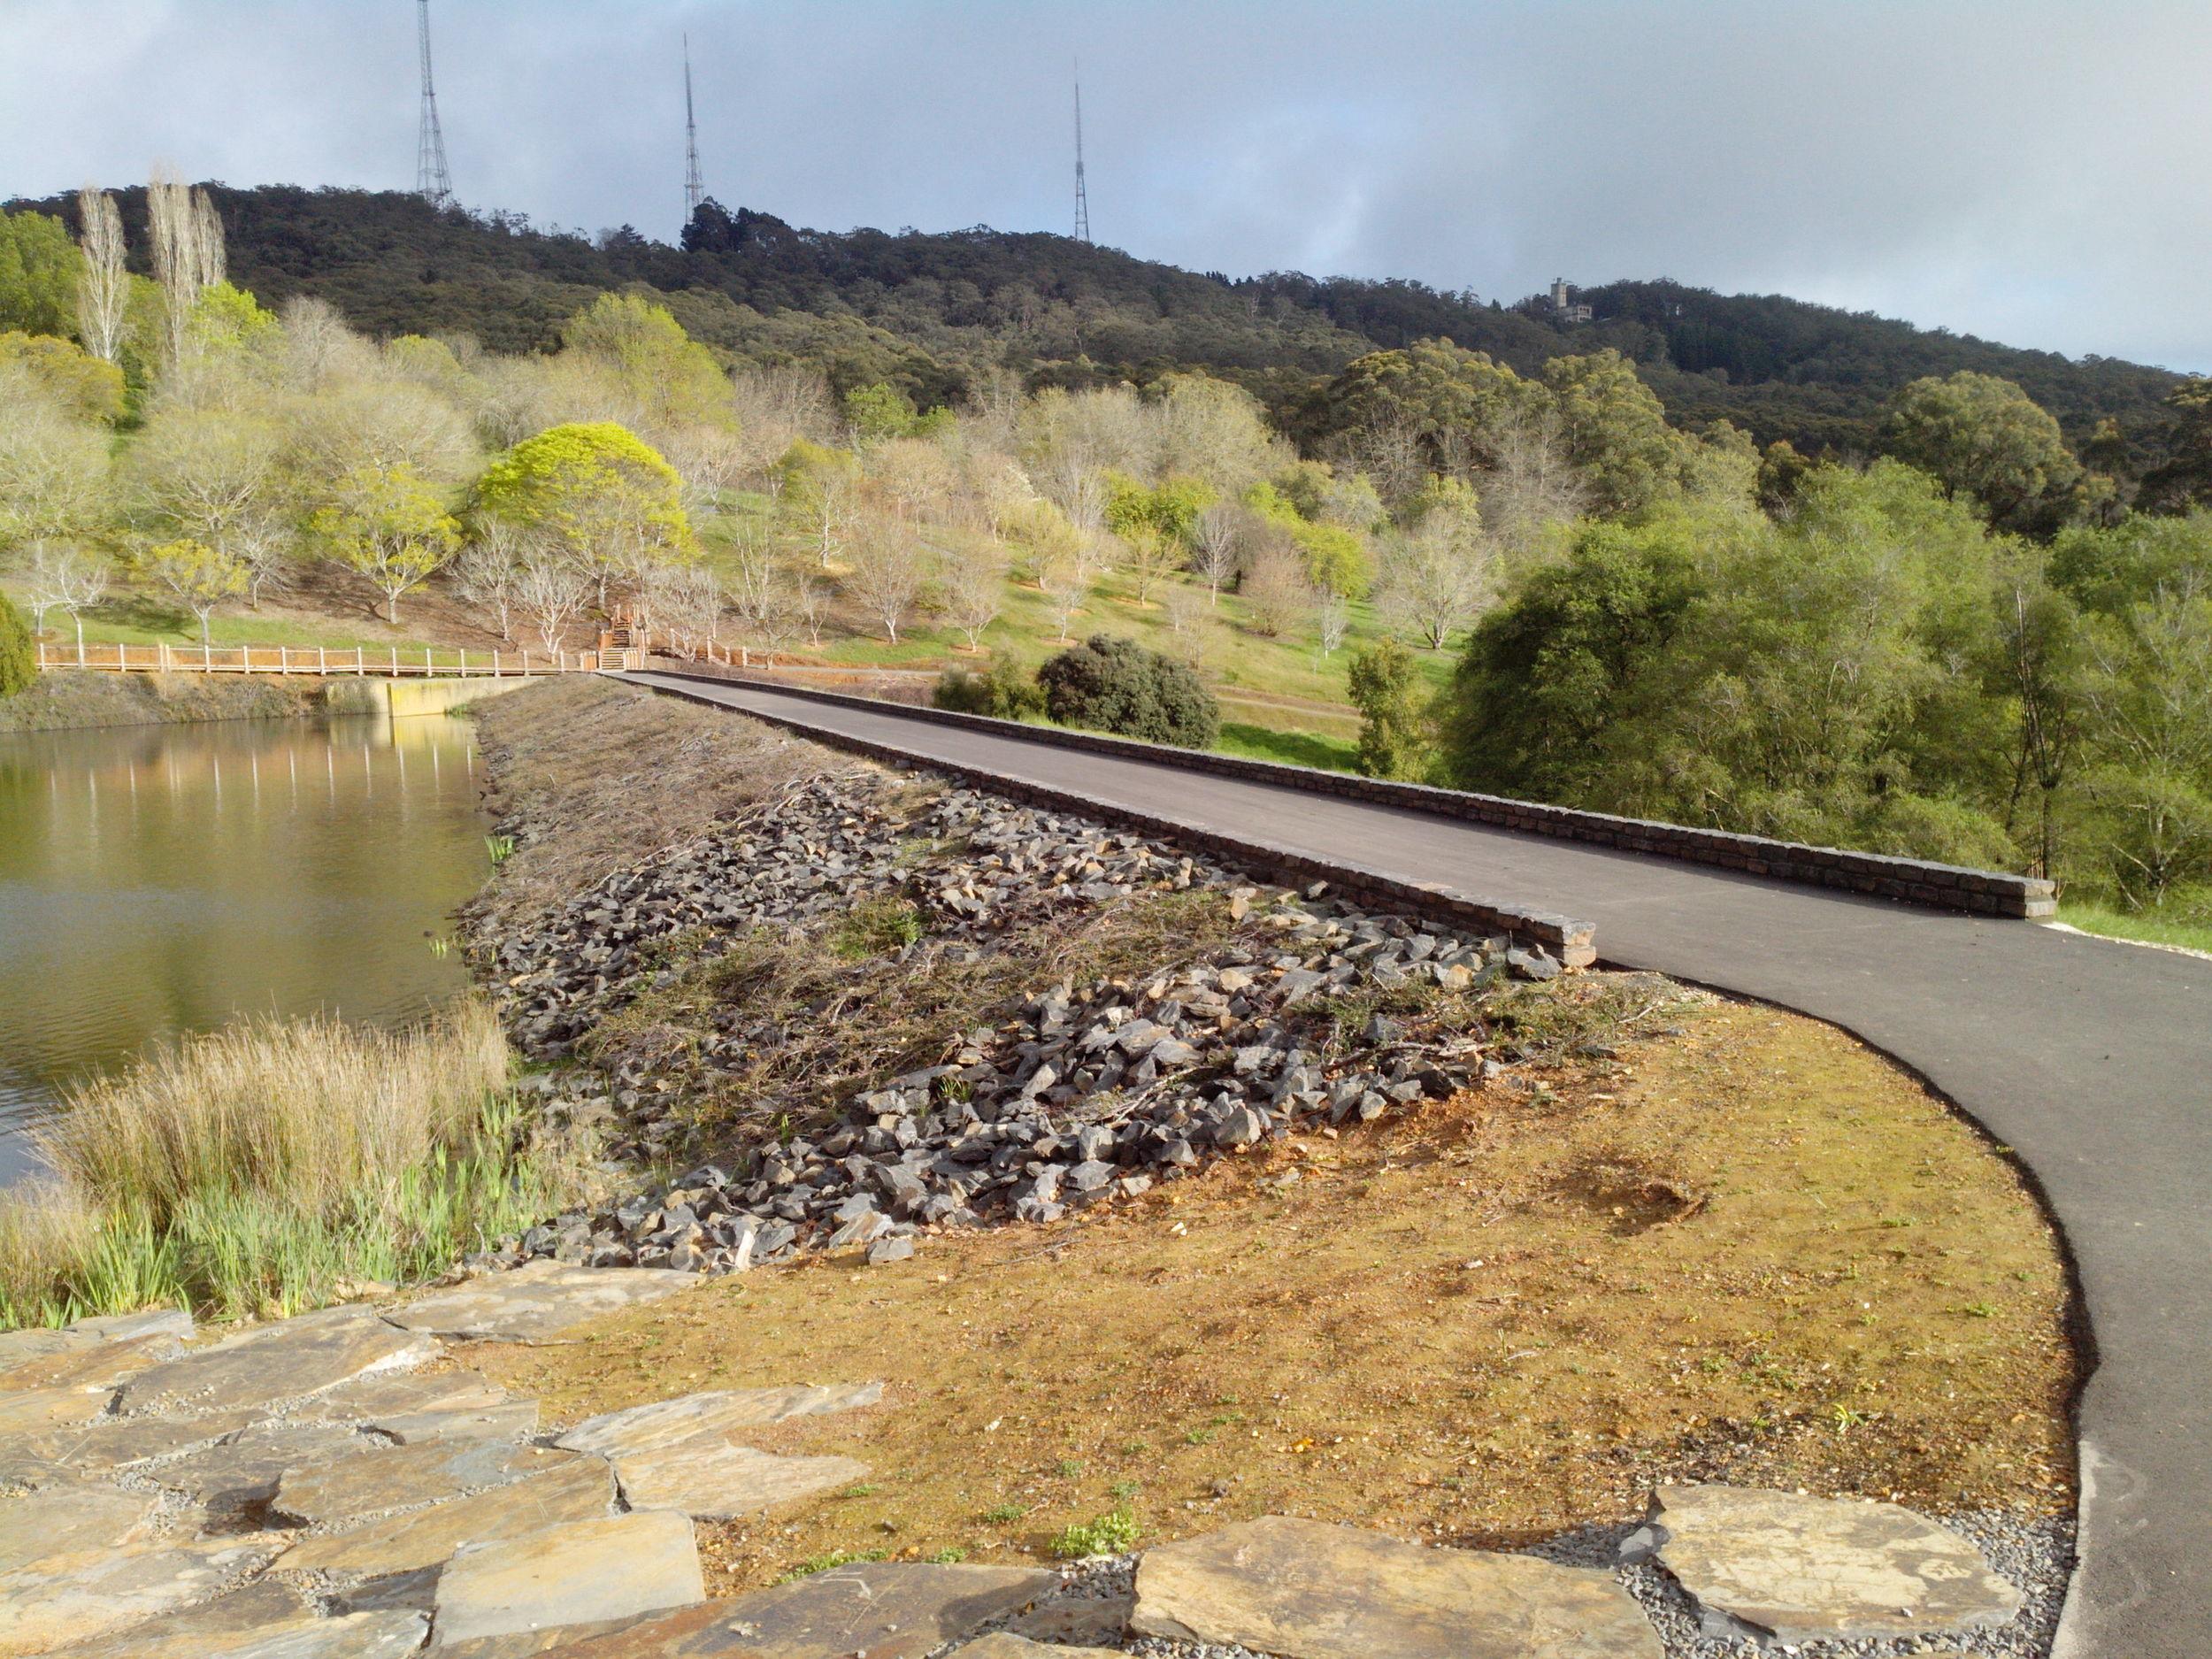 Low Basalt walls. Mt Lofty Botanical Gardens, Adelaide, South Australia.